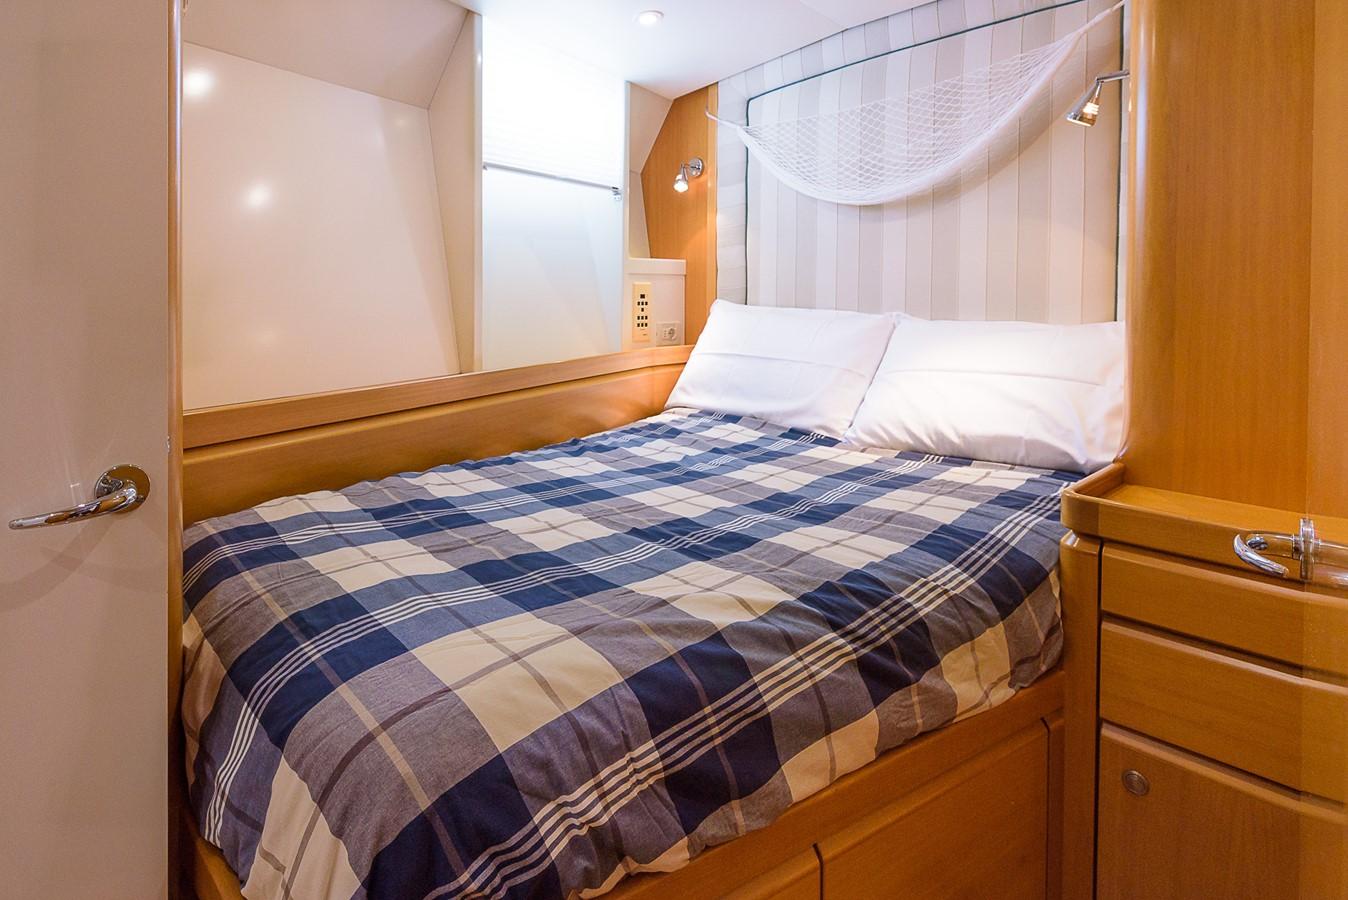 Guest Cabin 2000 KELLY ARCHER Van de Stadt Cruising Sailboat Cruising Sailboat 2481180